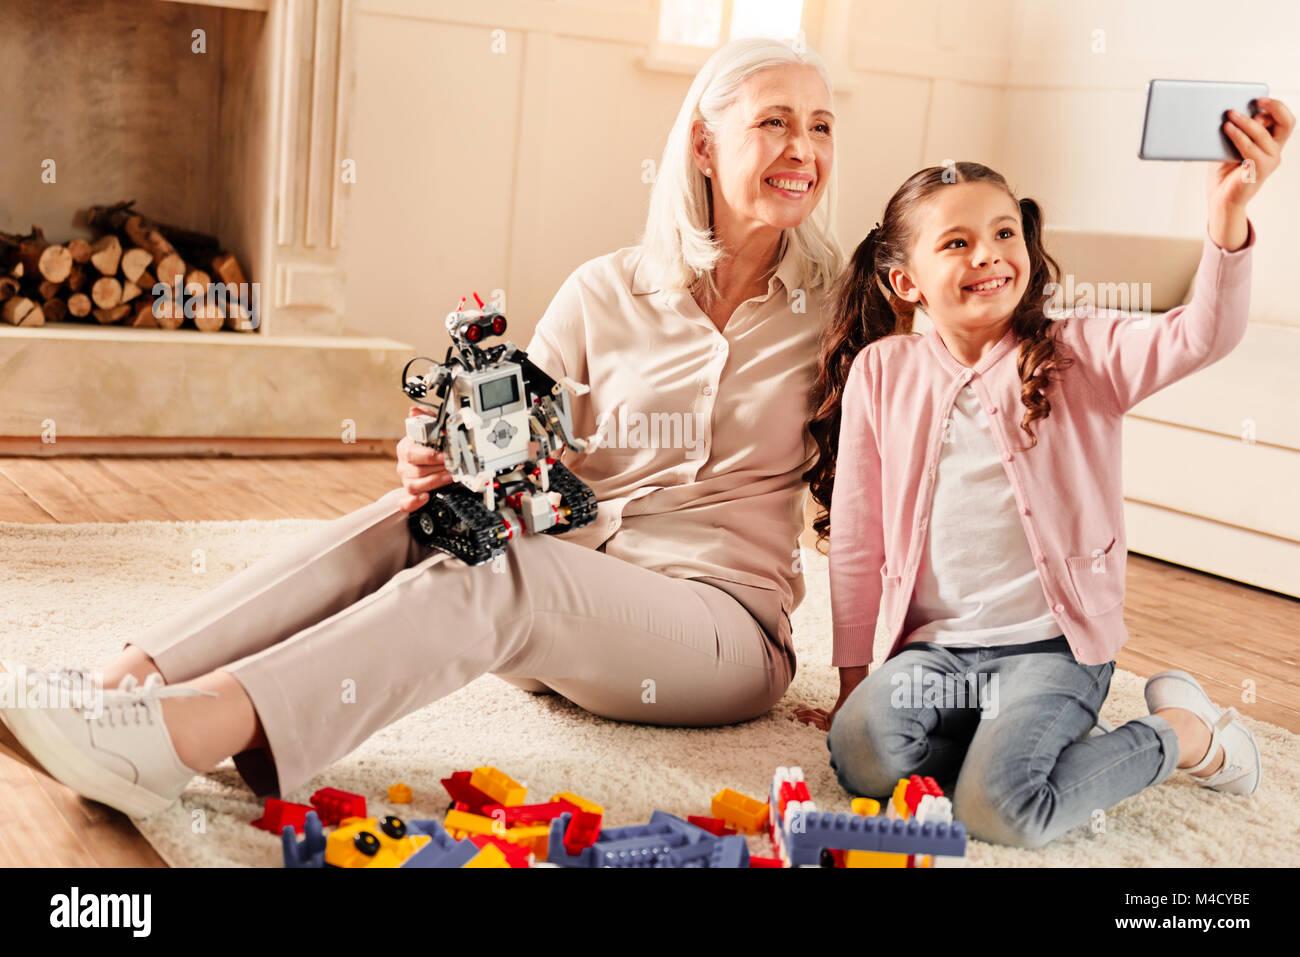 Smart Little Girl tomando selfie con abuela radiante Imagen De Stock